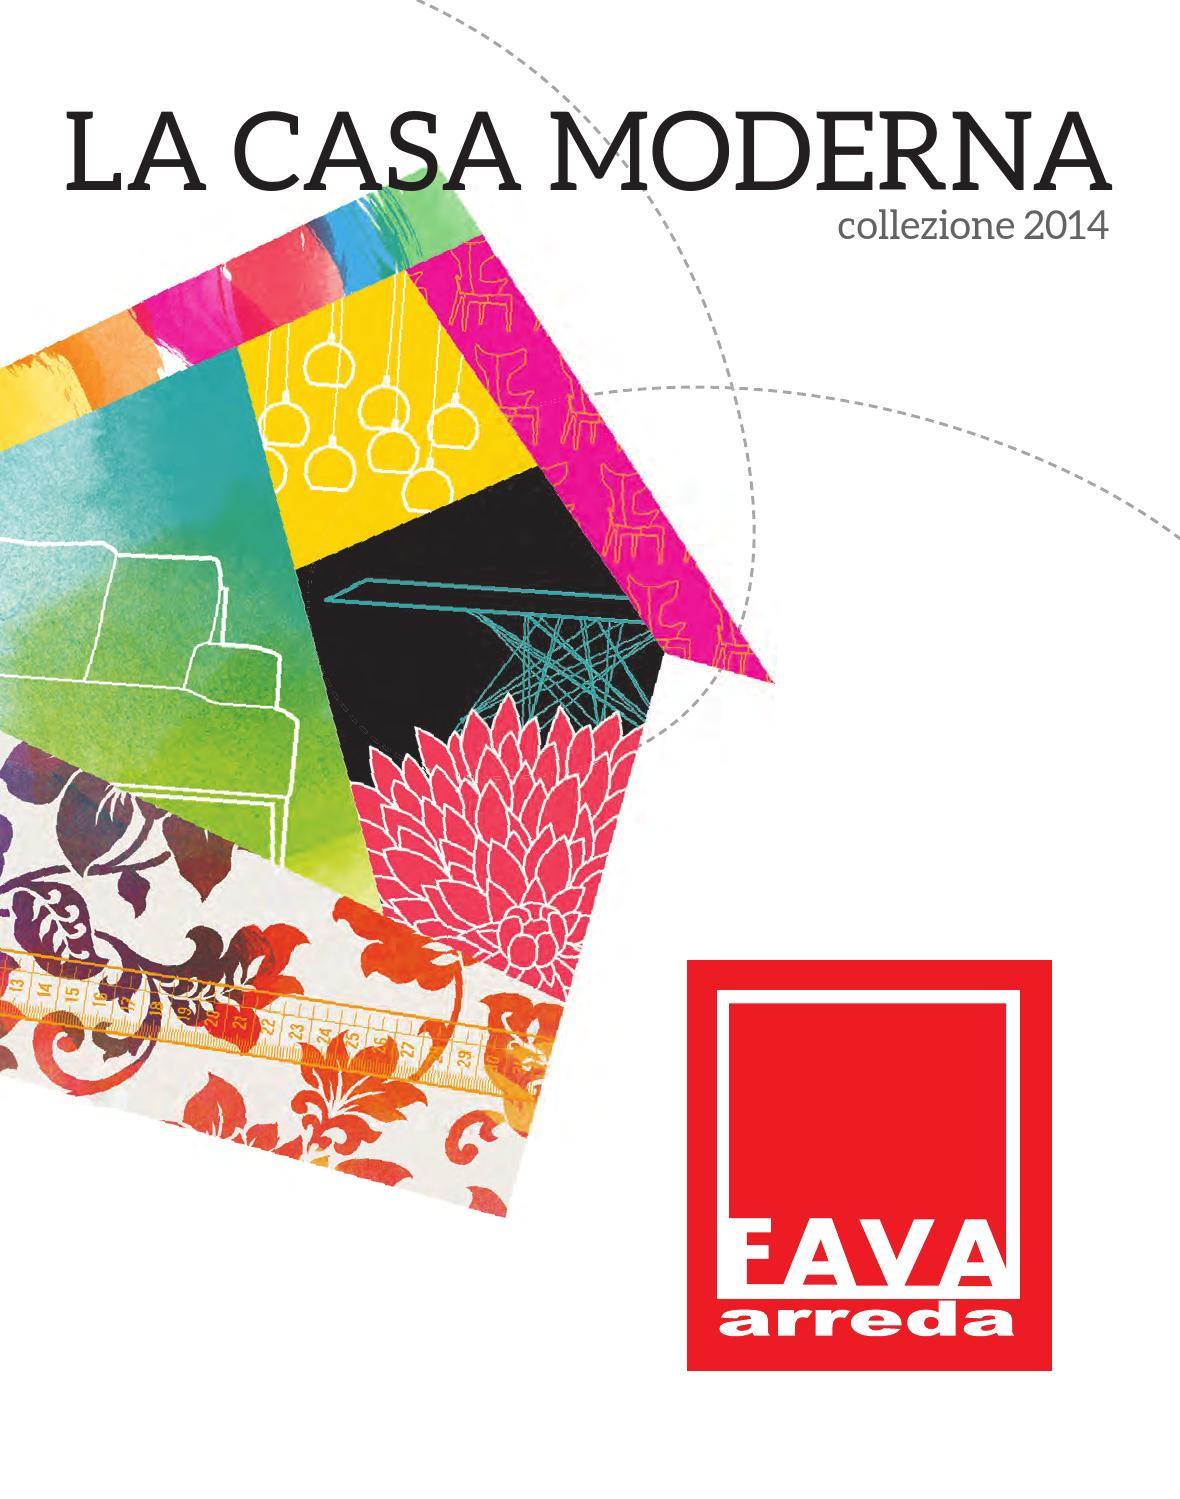 Fava arreda la casa moderna by ciociaria24 issuu for Mobili fava sora